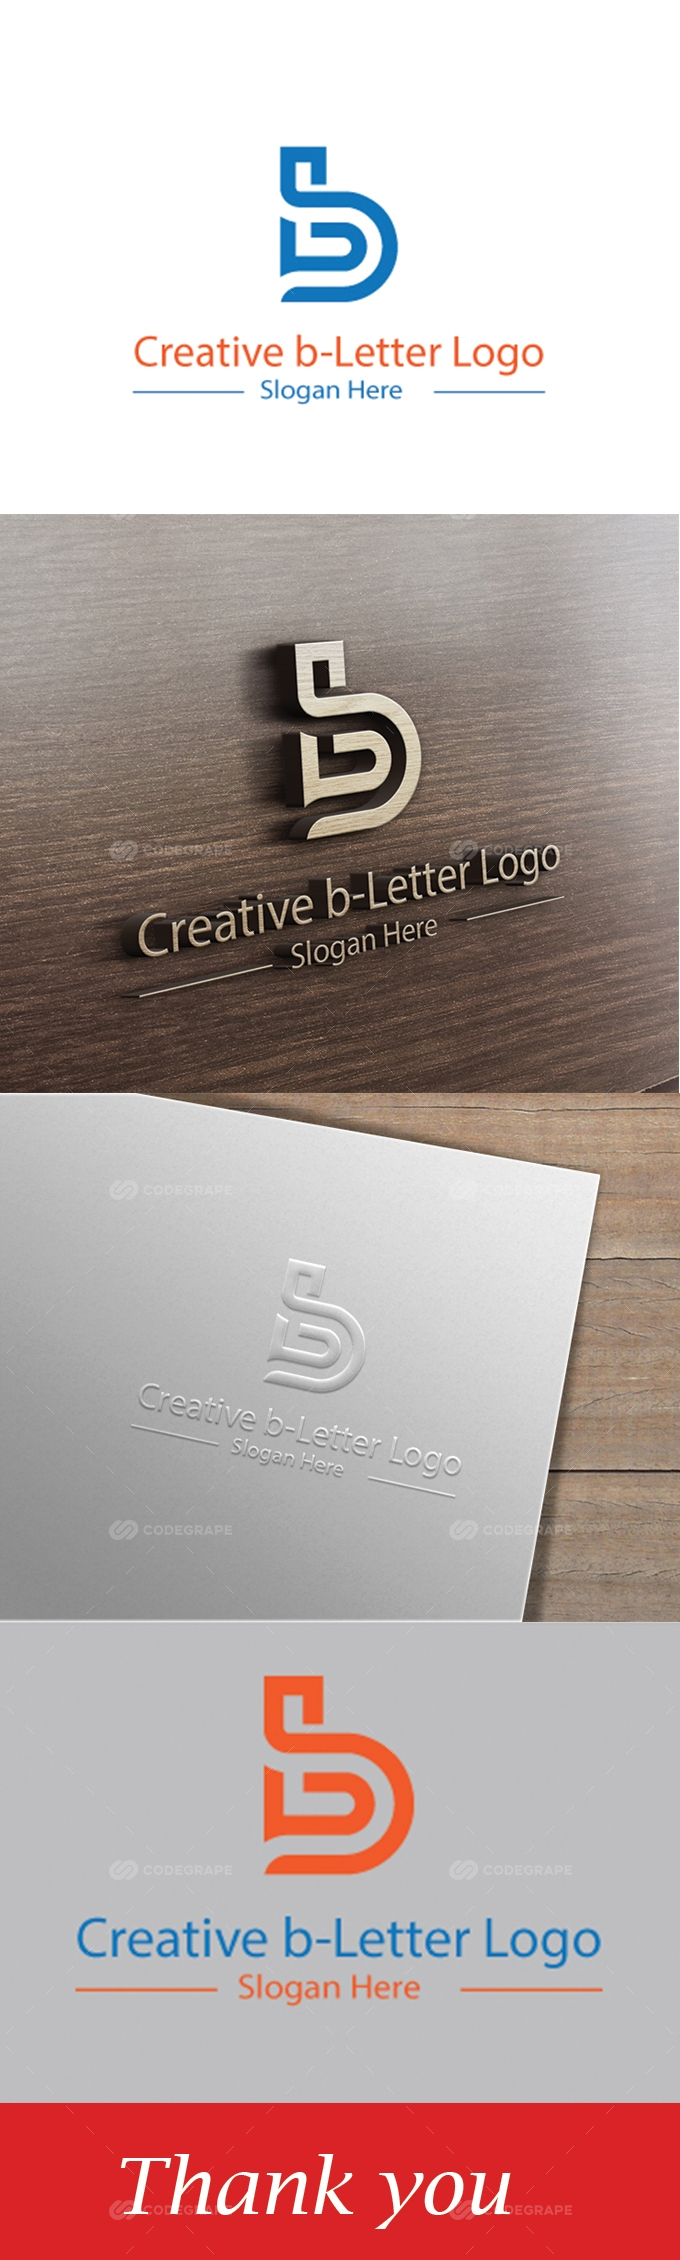 Creative b- Letter Logo